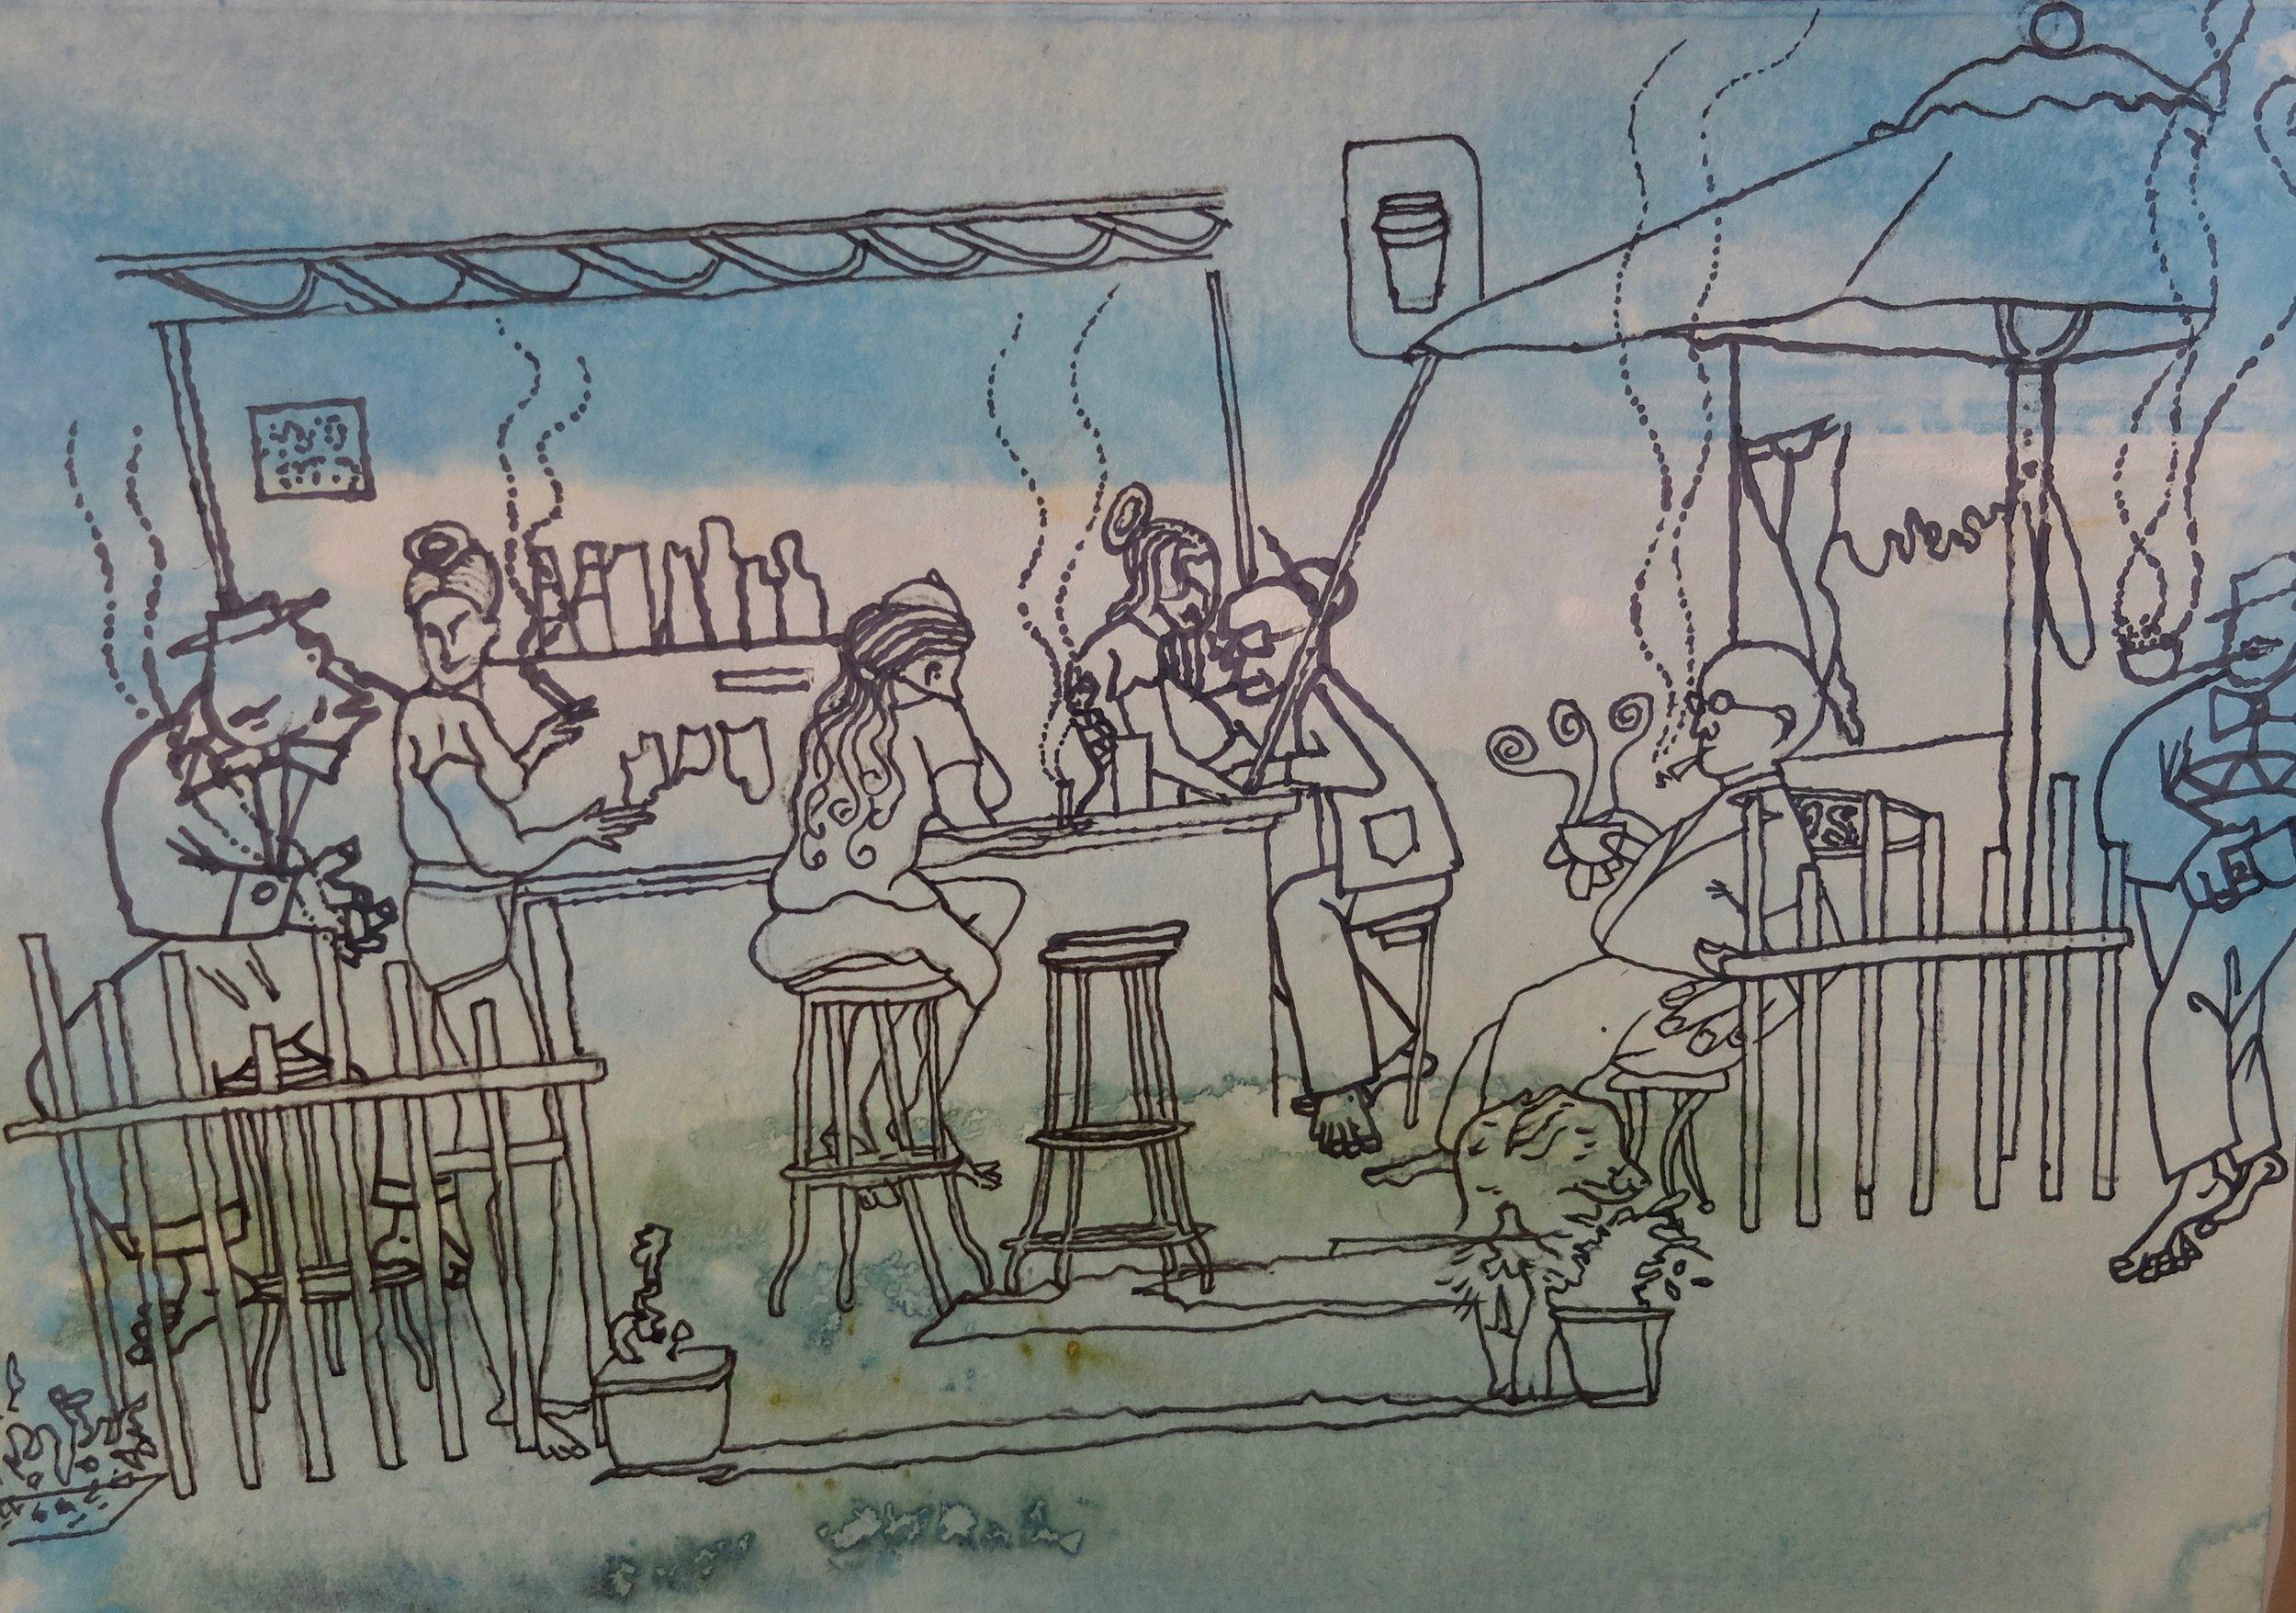 - 'Chilled'ByEllen Johansen & M G WalkerAcrylic, pen and ink on illustration board